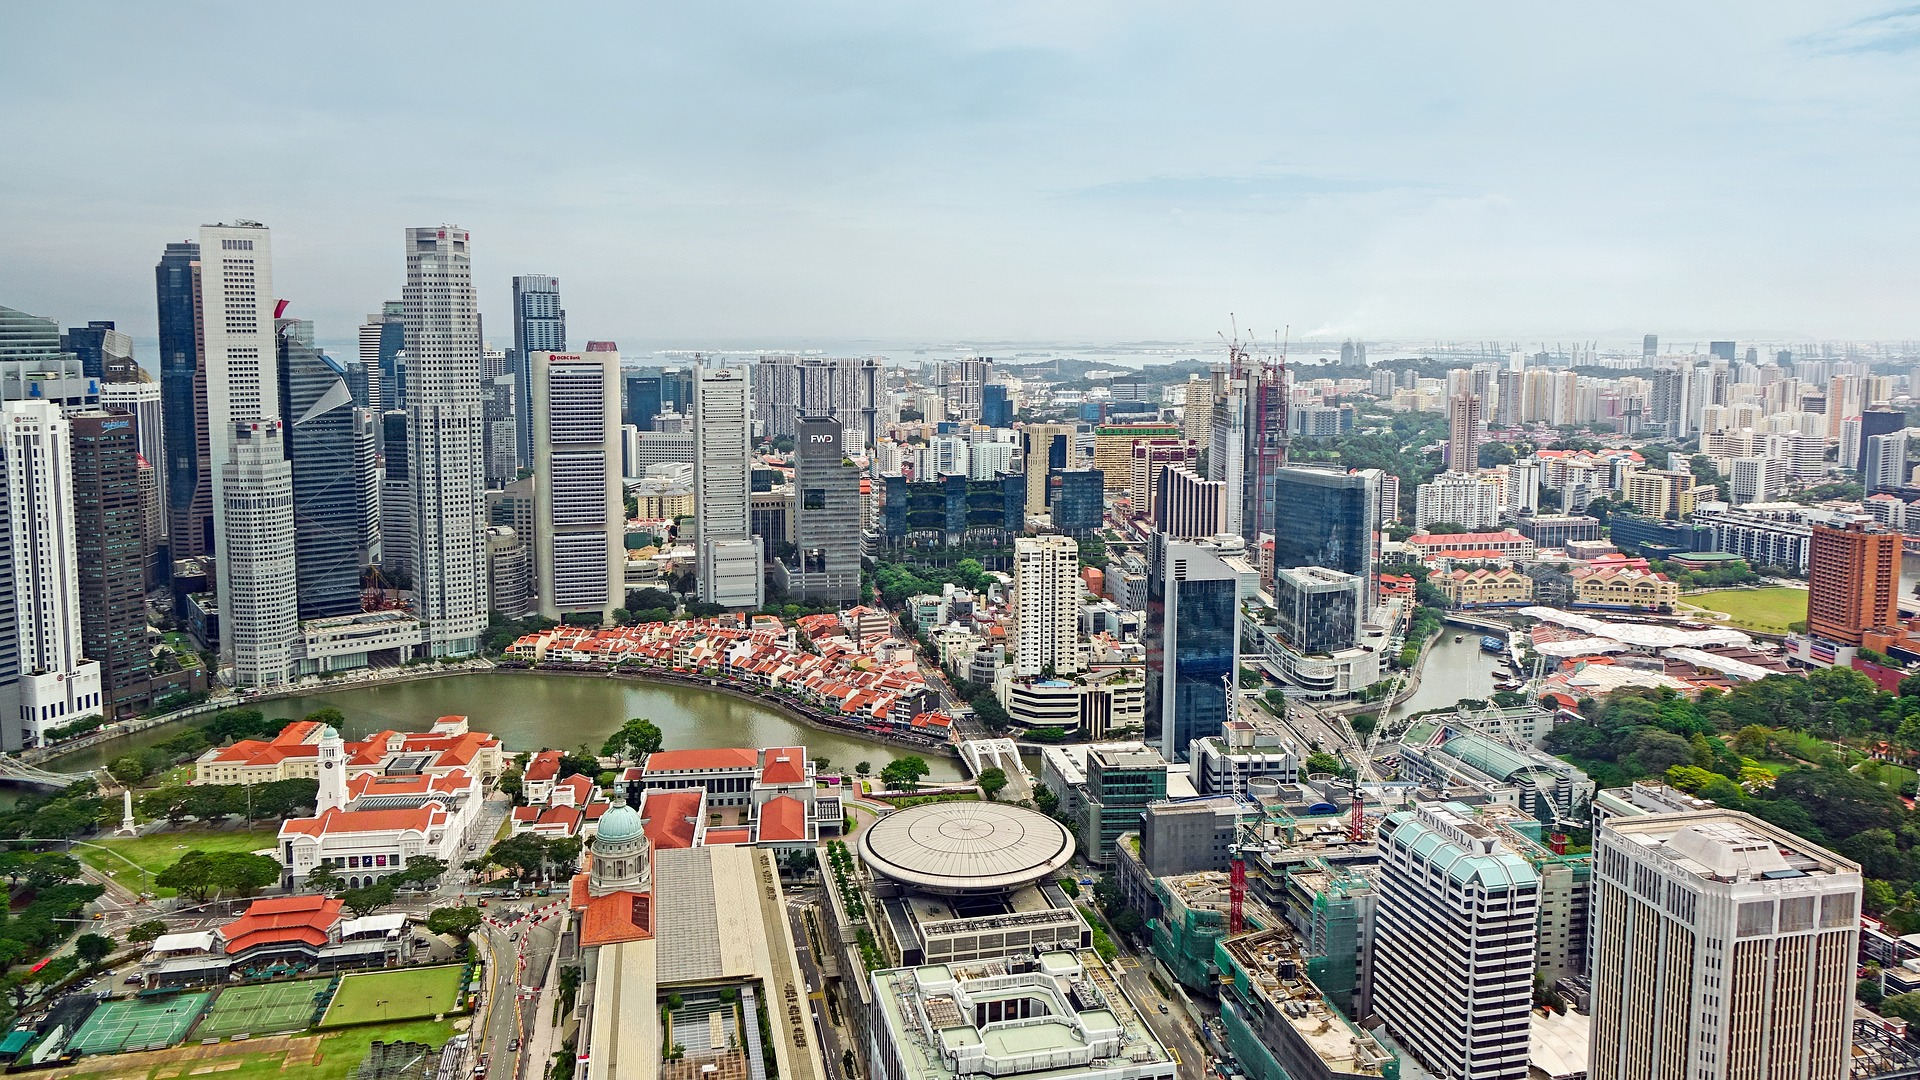 EDGEPROP SINGAPORE - Commercial property transaction volumes - EDGEPROP SINGAPORE